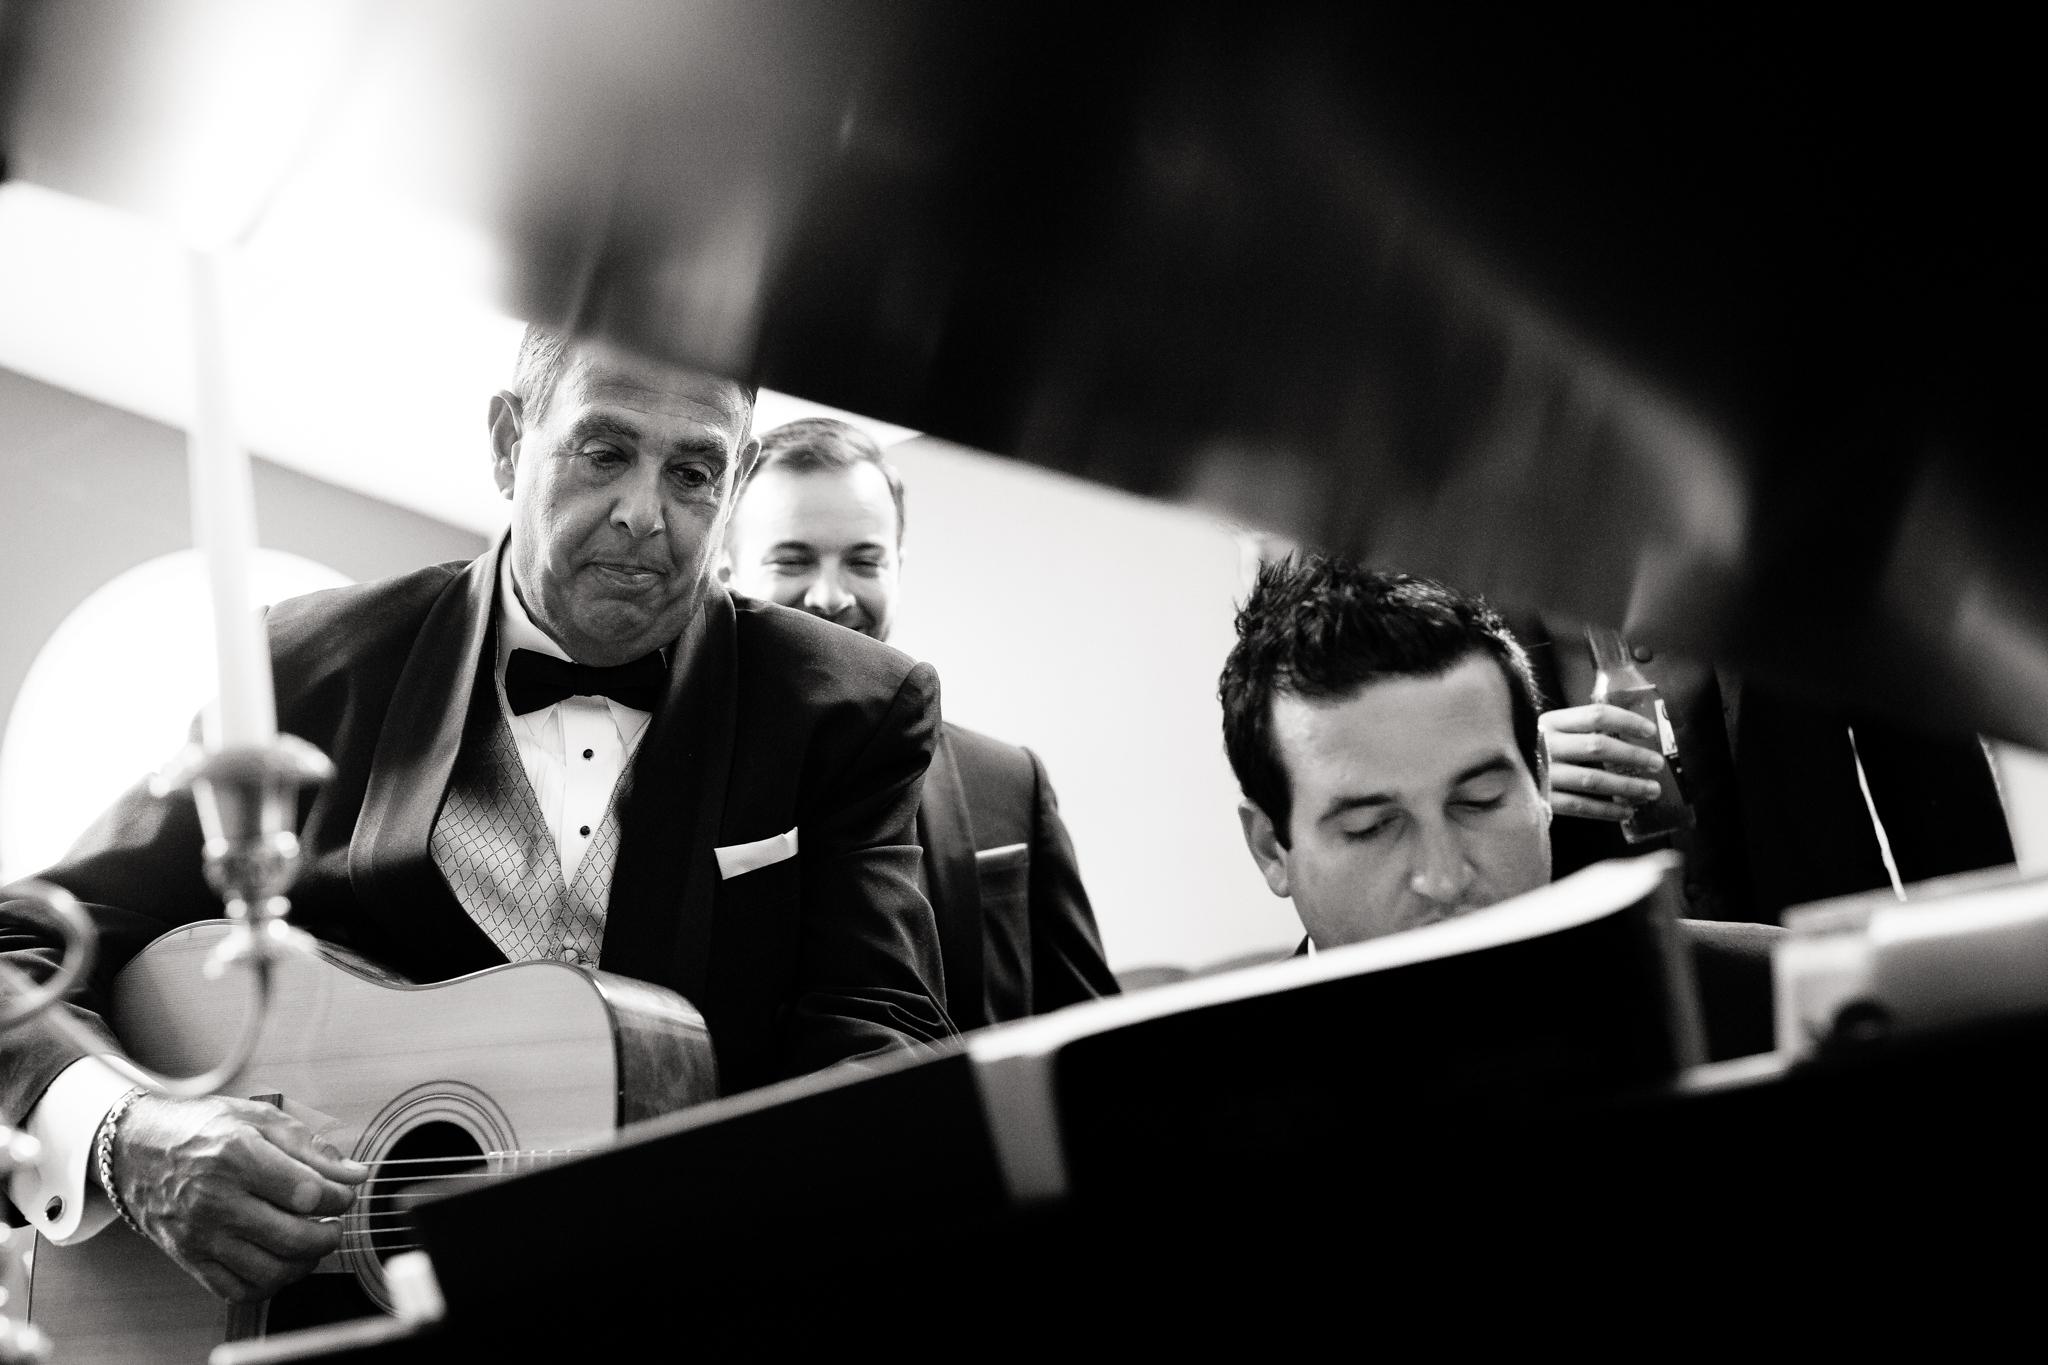 Statler-City-Buffalo-wedding-photographer- 0129bw.jpg